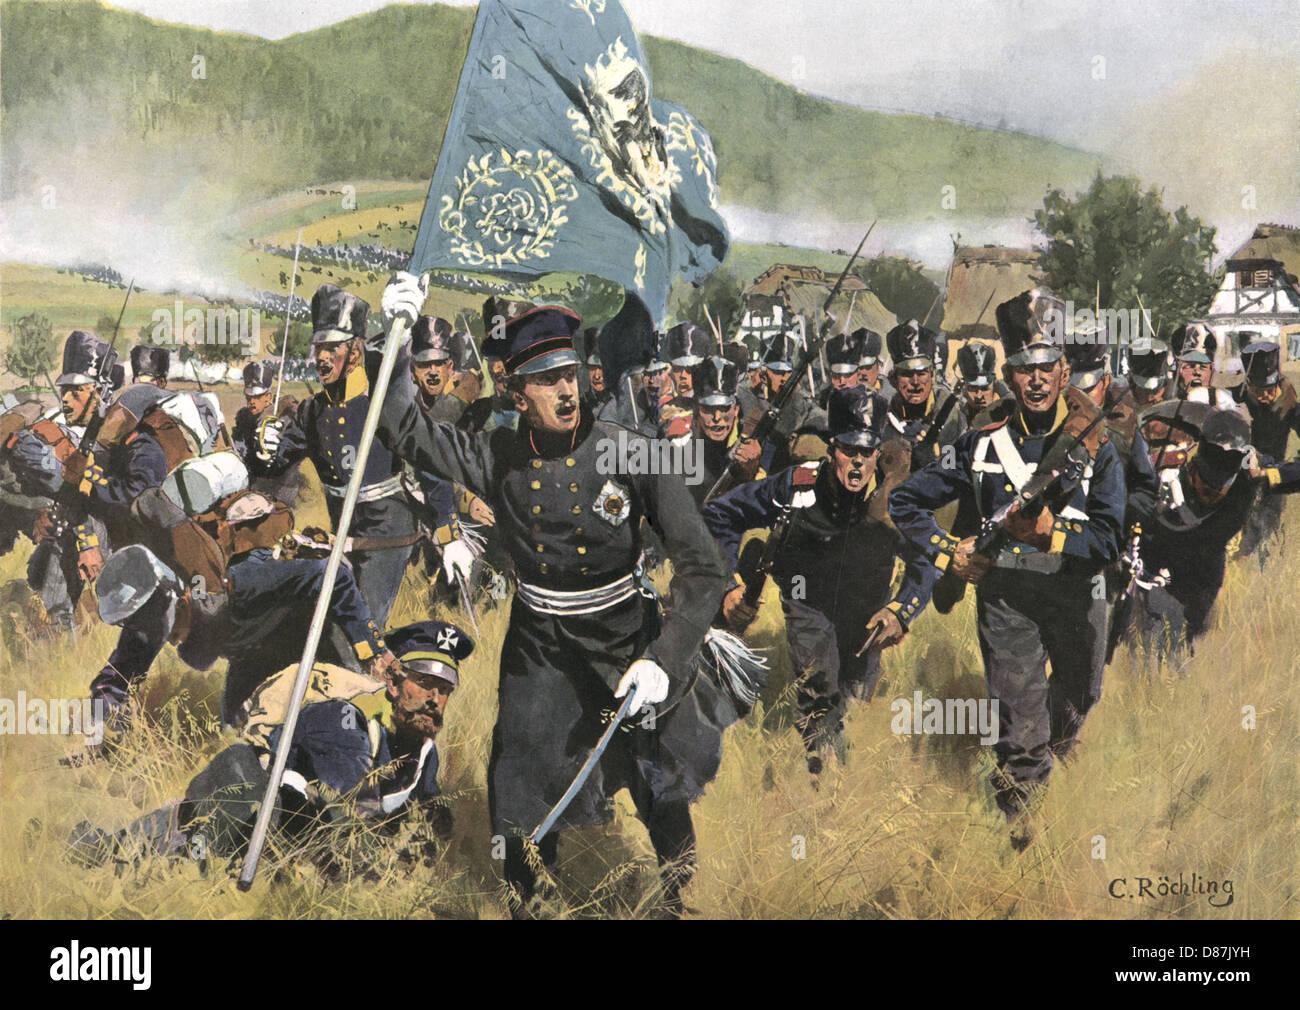 napoleonic wars 1813 stock photo 56716901 alamy